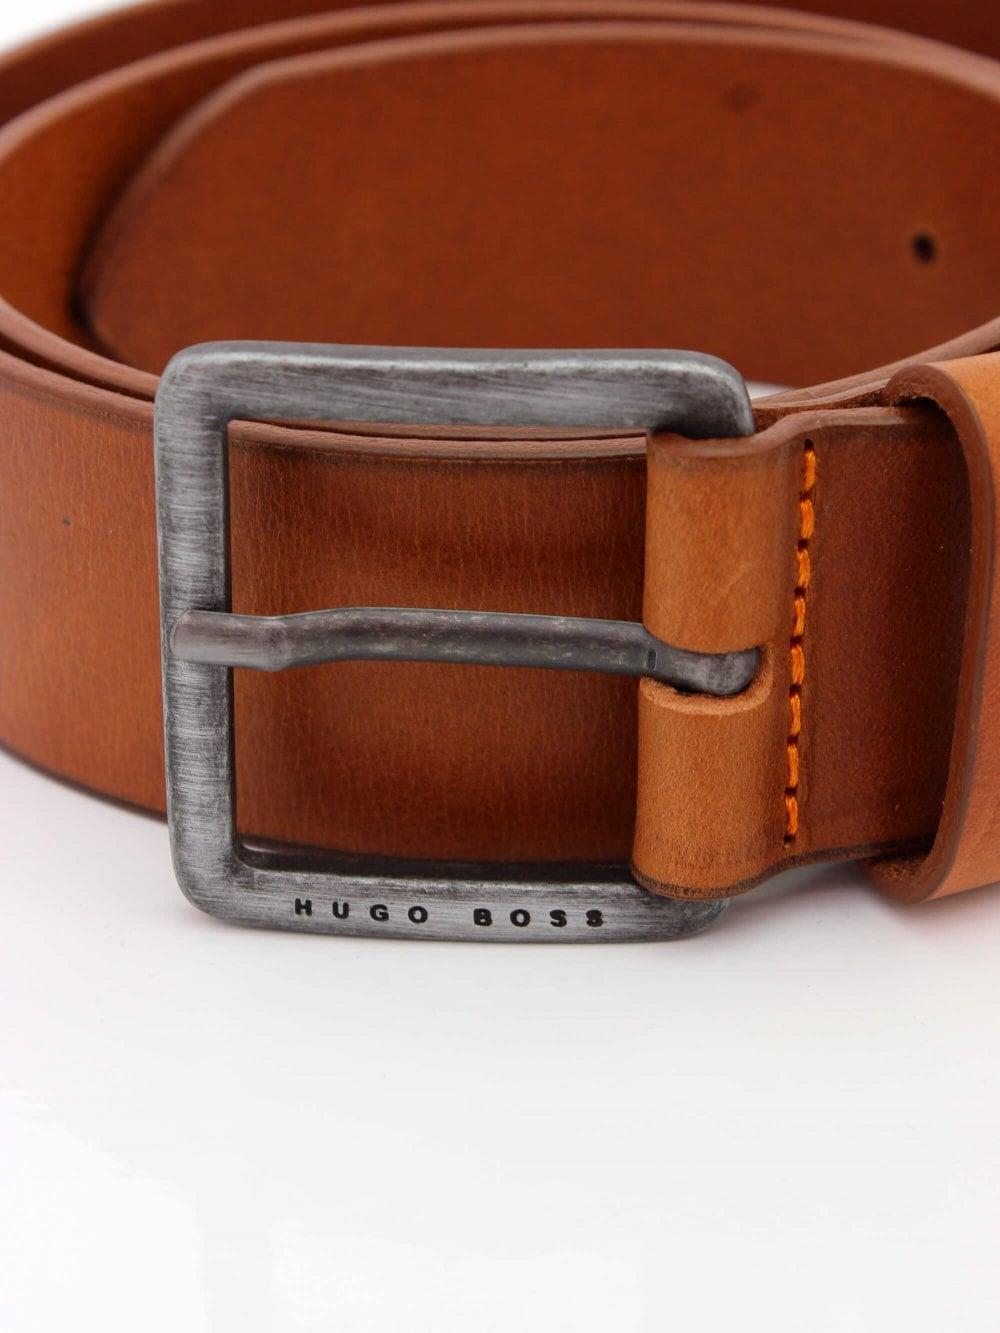 dd93a32ba4b0 Hugo Boss Casual Jeeko Leather Belt in Medium Brown | Northern Threads